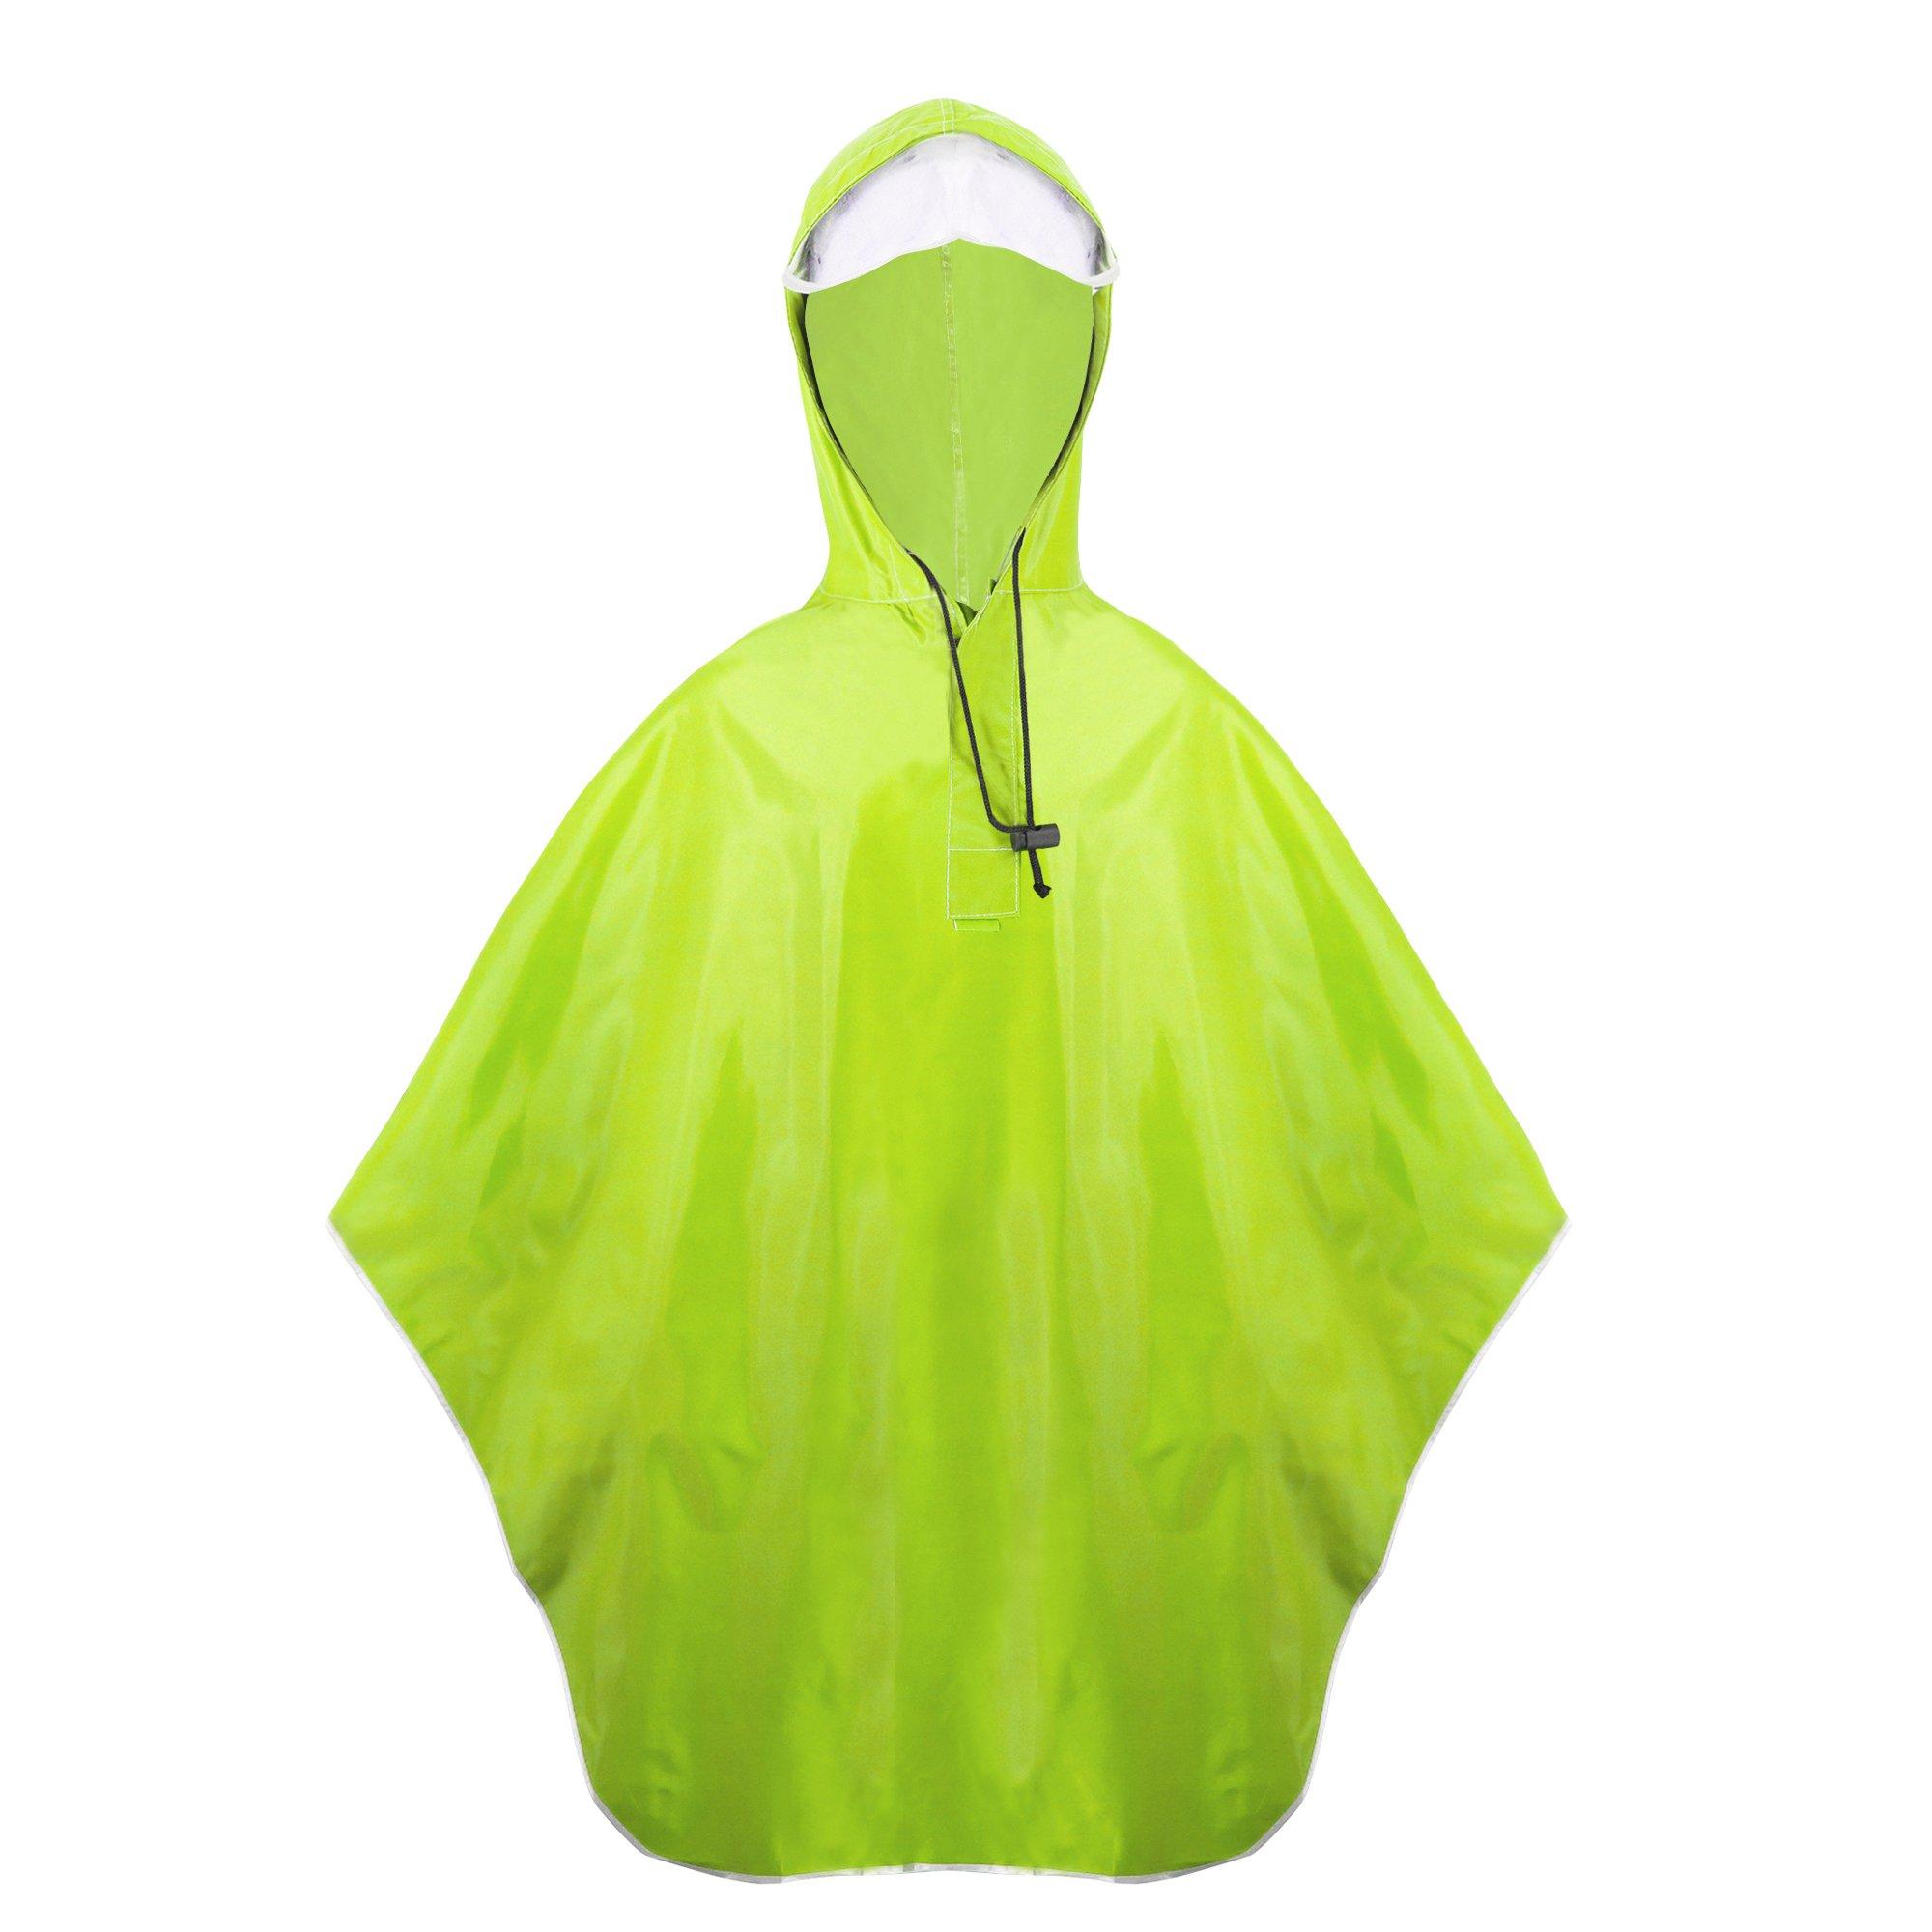 Balnna Women Rain Poncho and Zipper Waterproof Raincoat for Outdoor Activities-Yellow